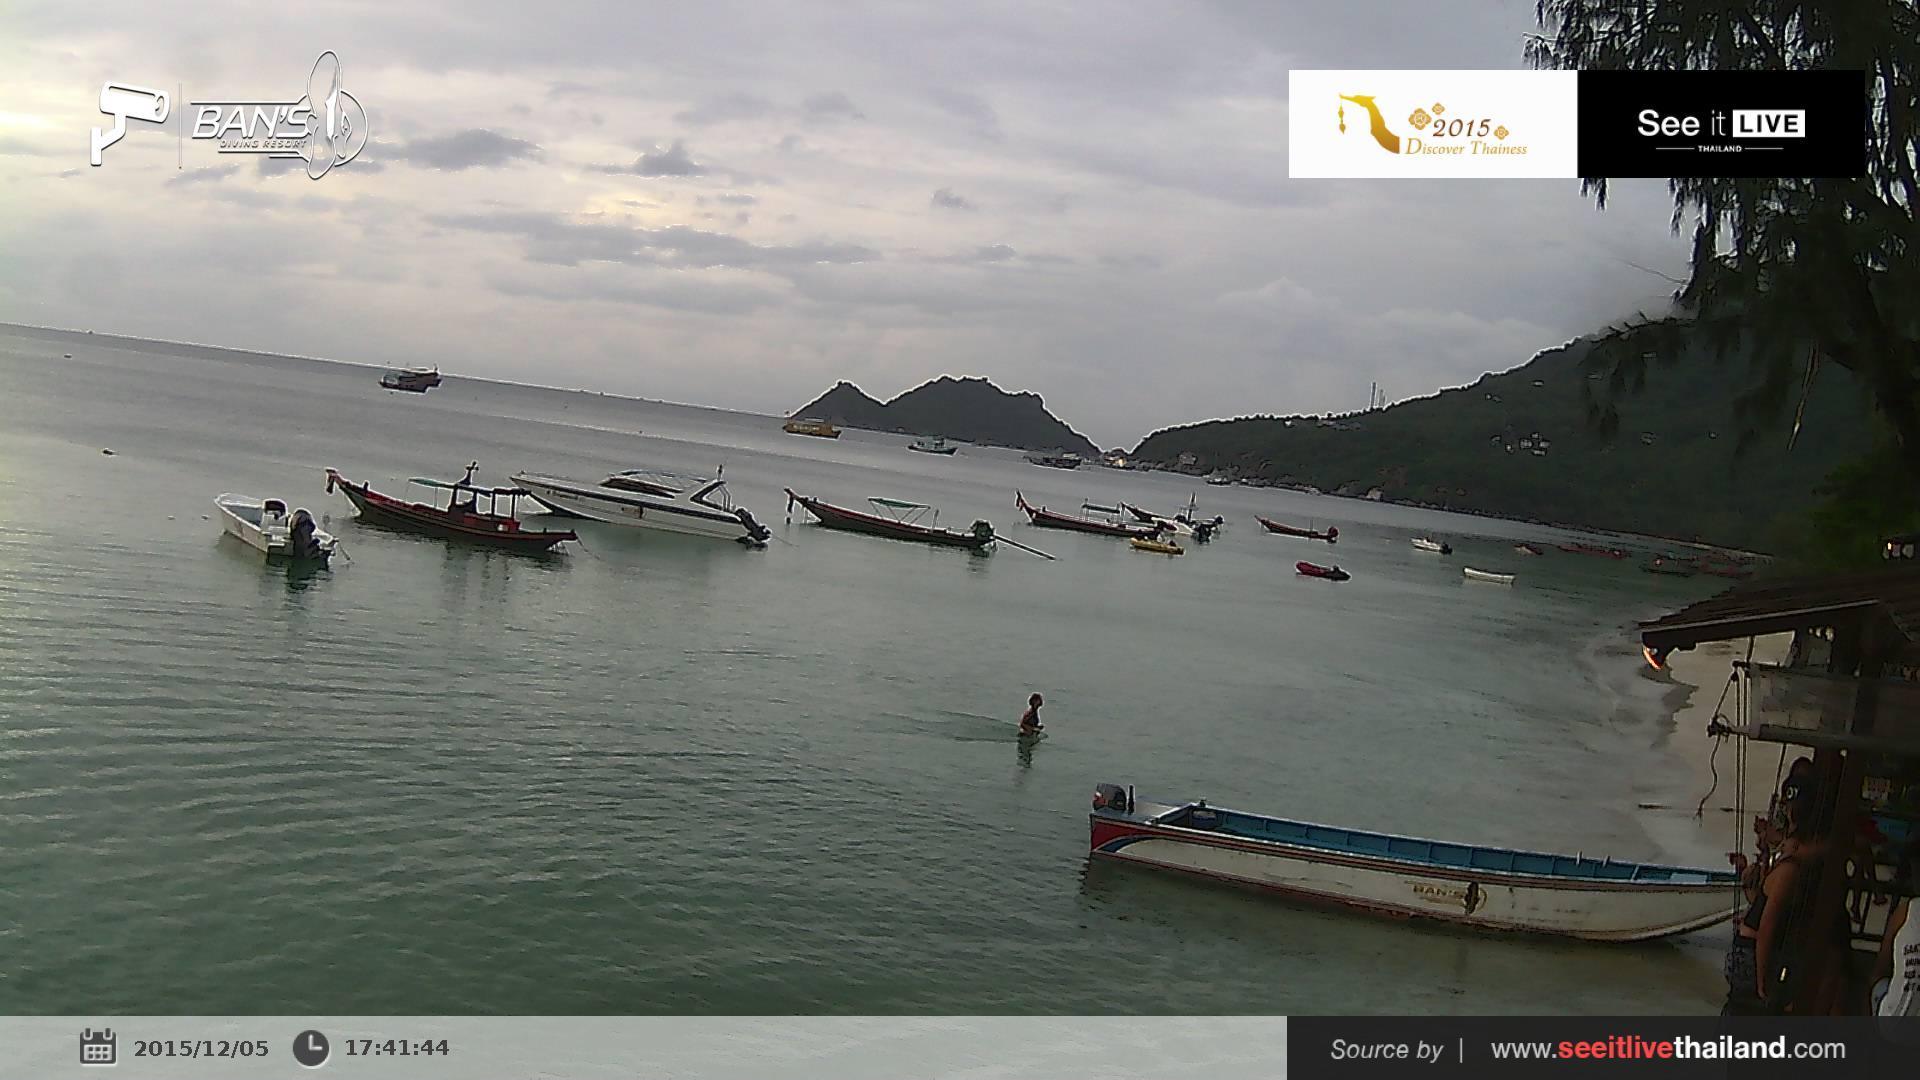 Webcam บ้านหาดทรายรี: Sairee Beach − Ban Driving Resort